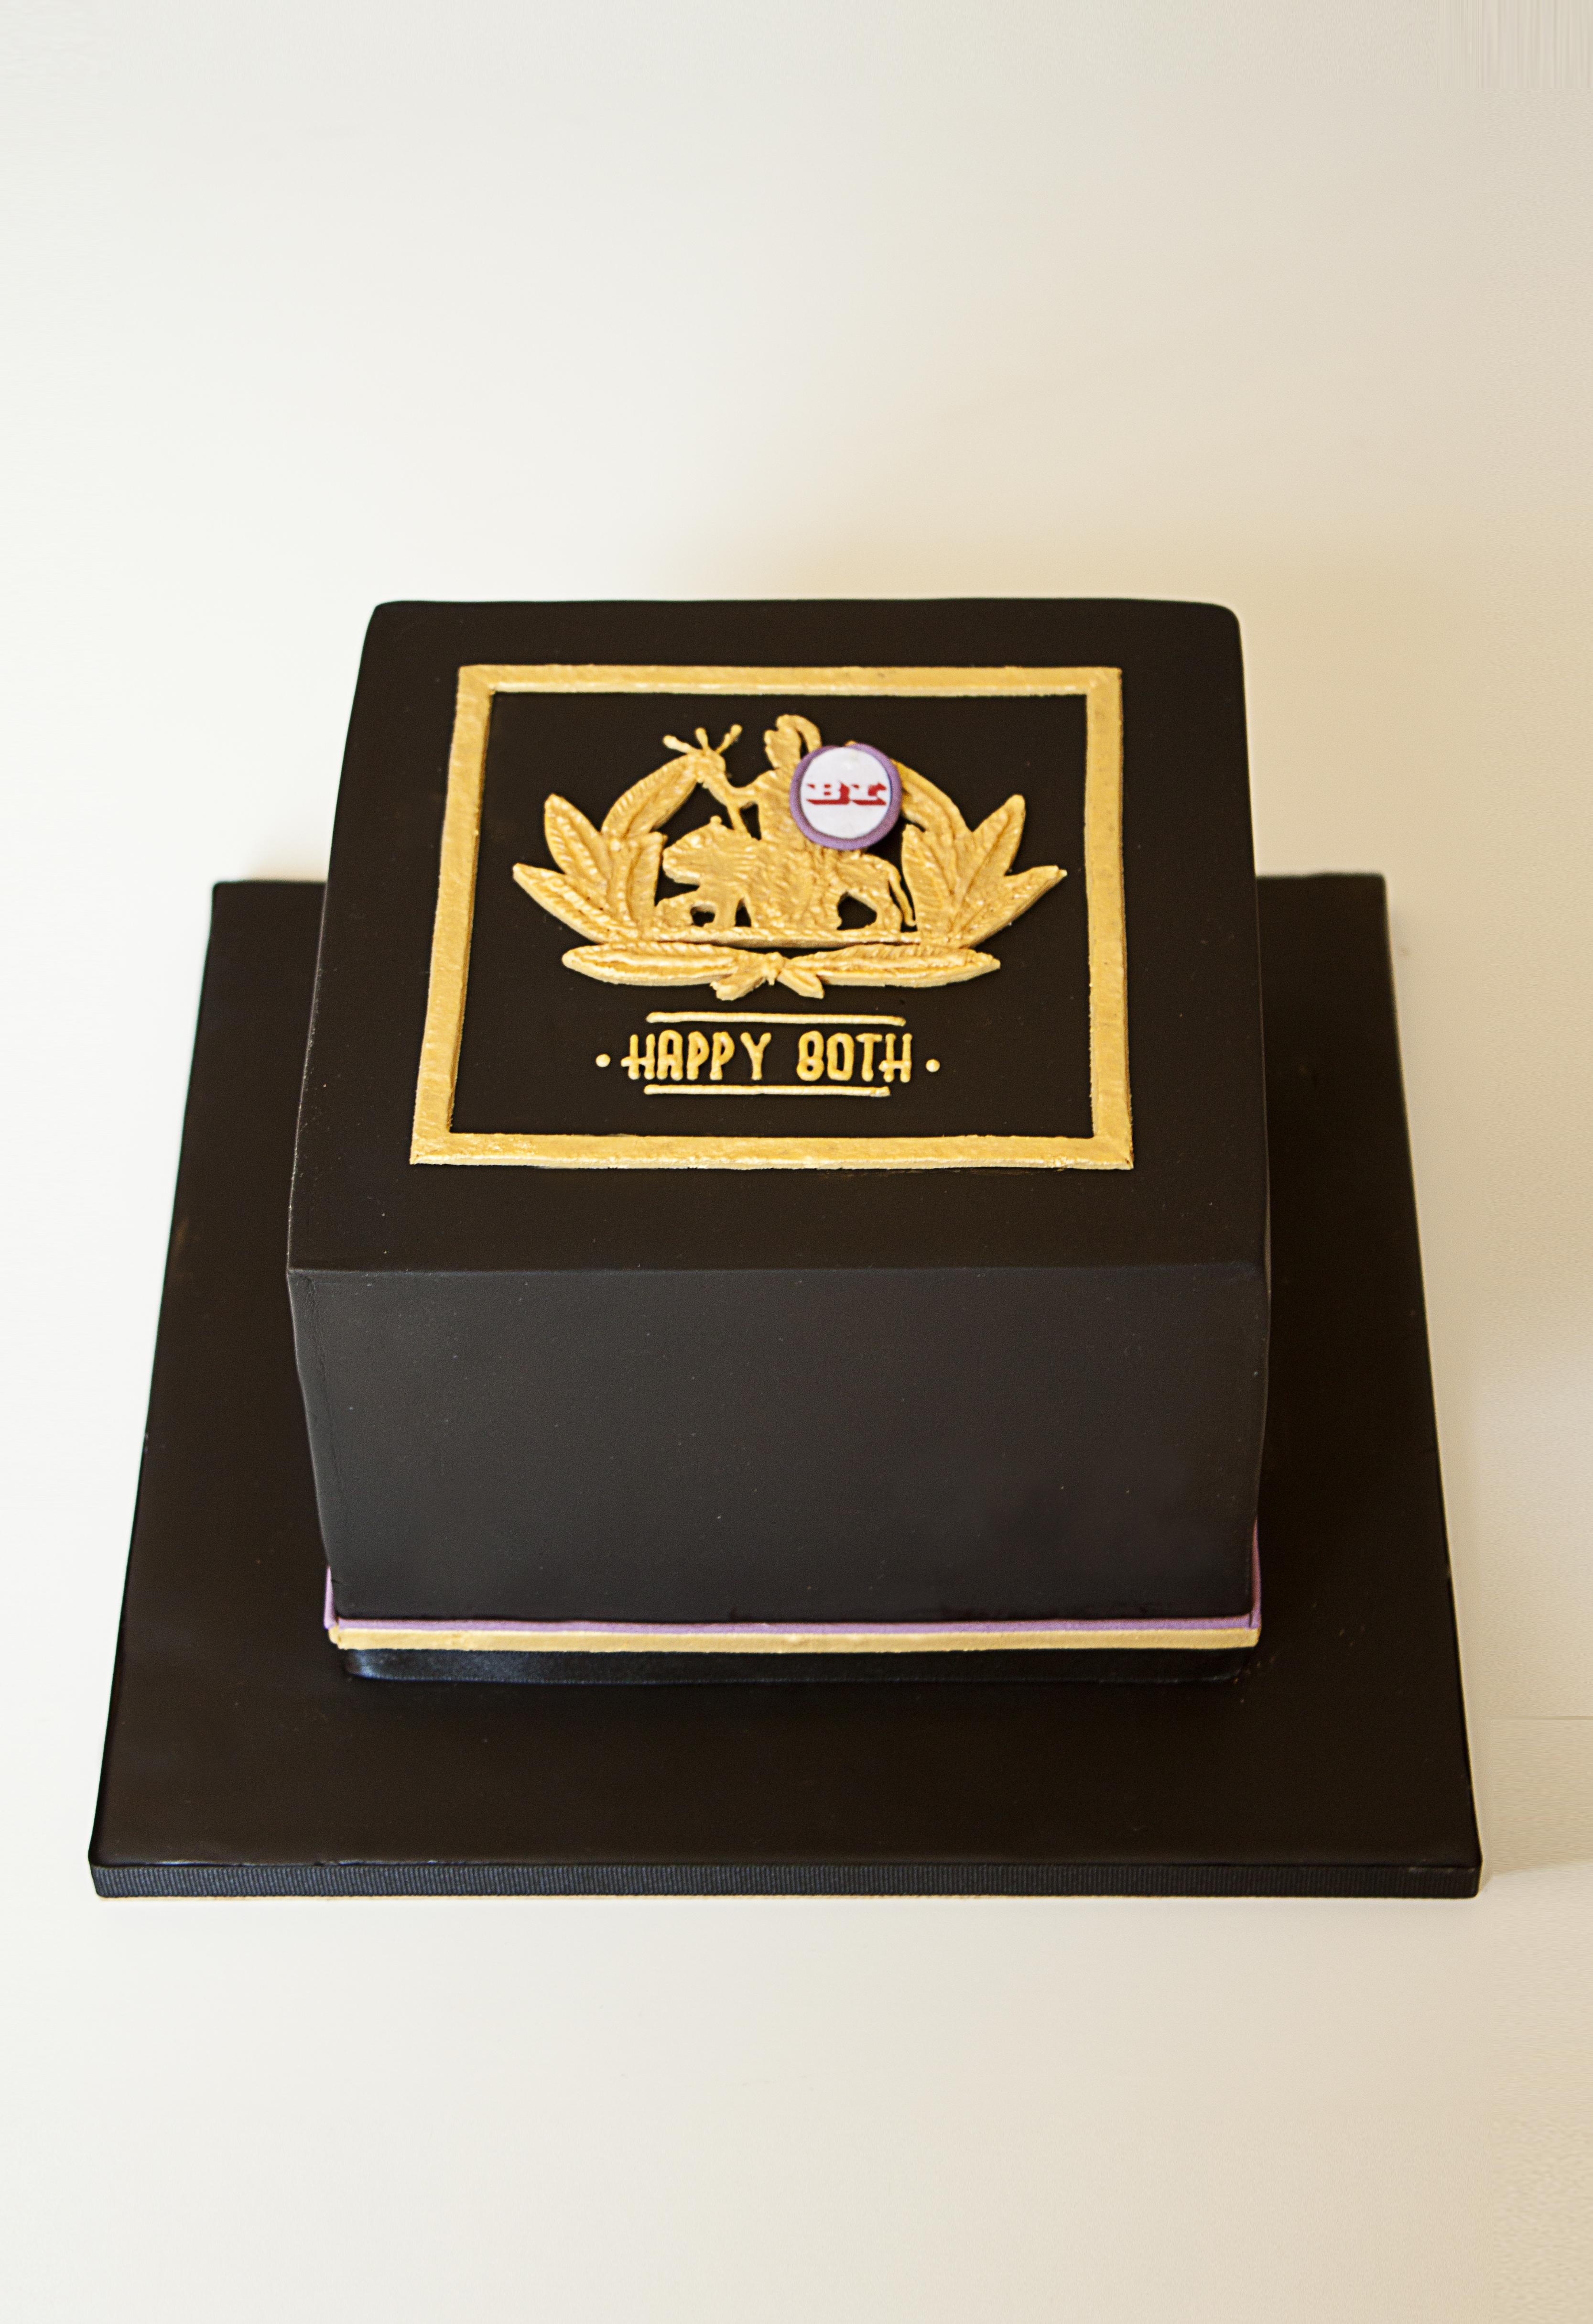 Seaman Cake Design